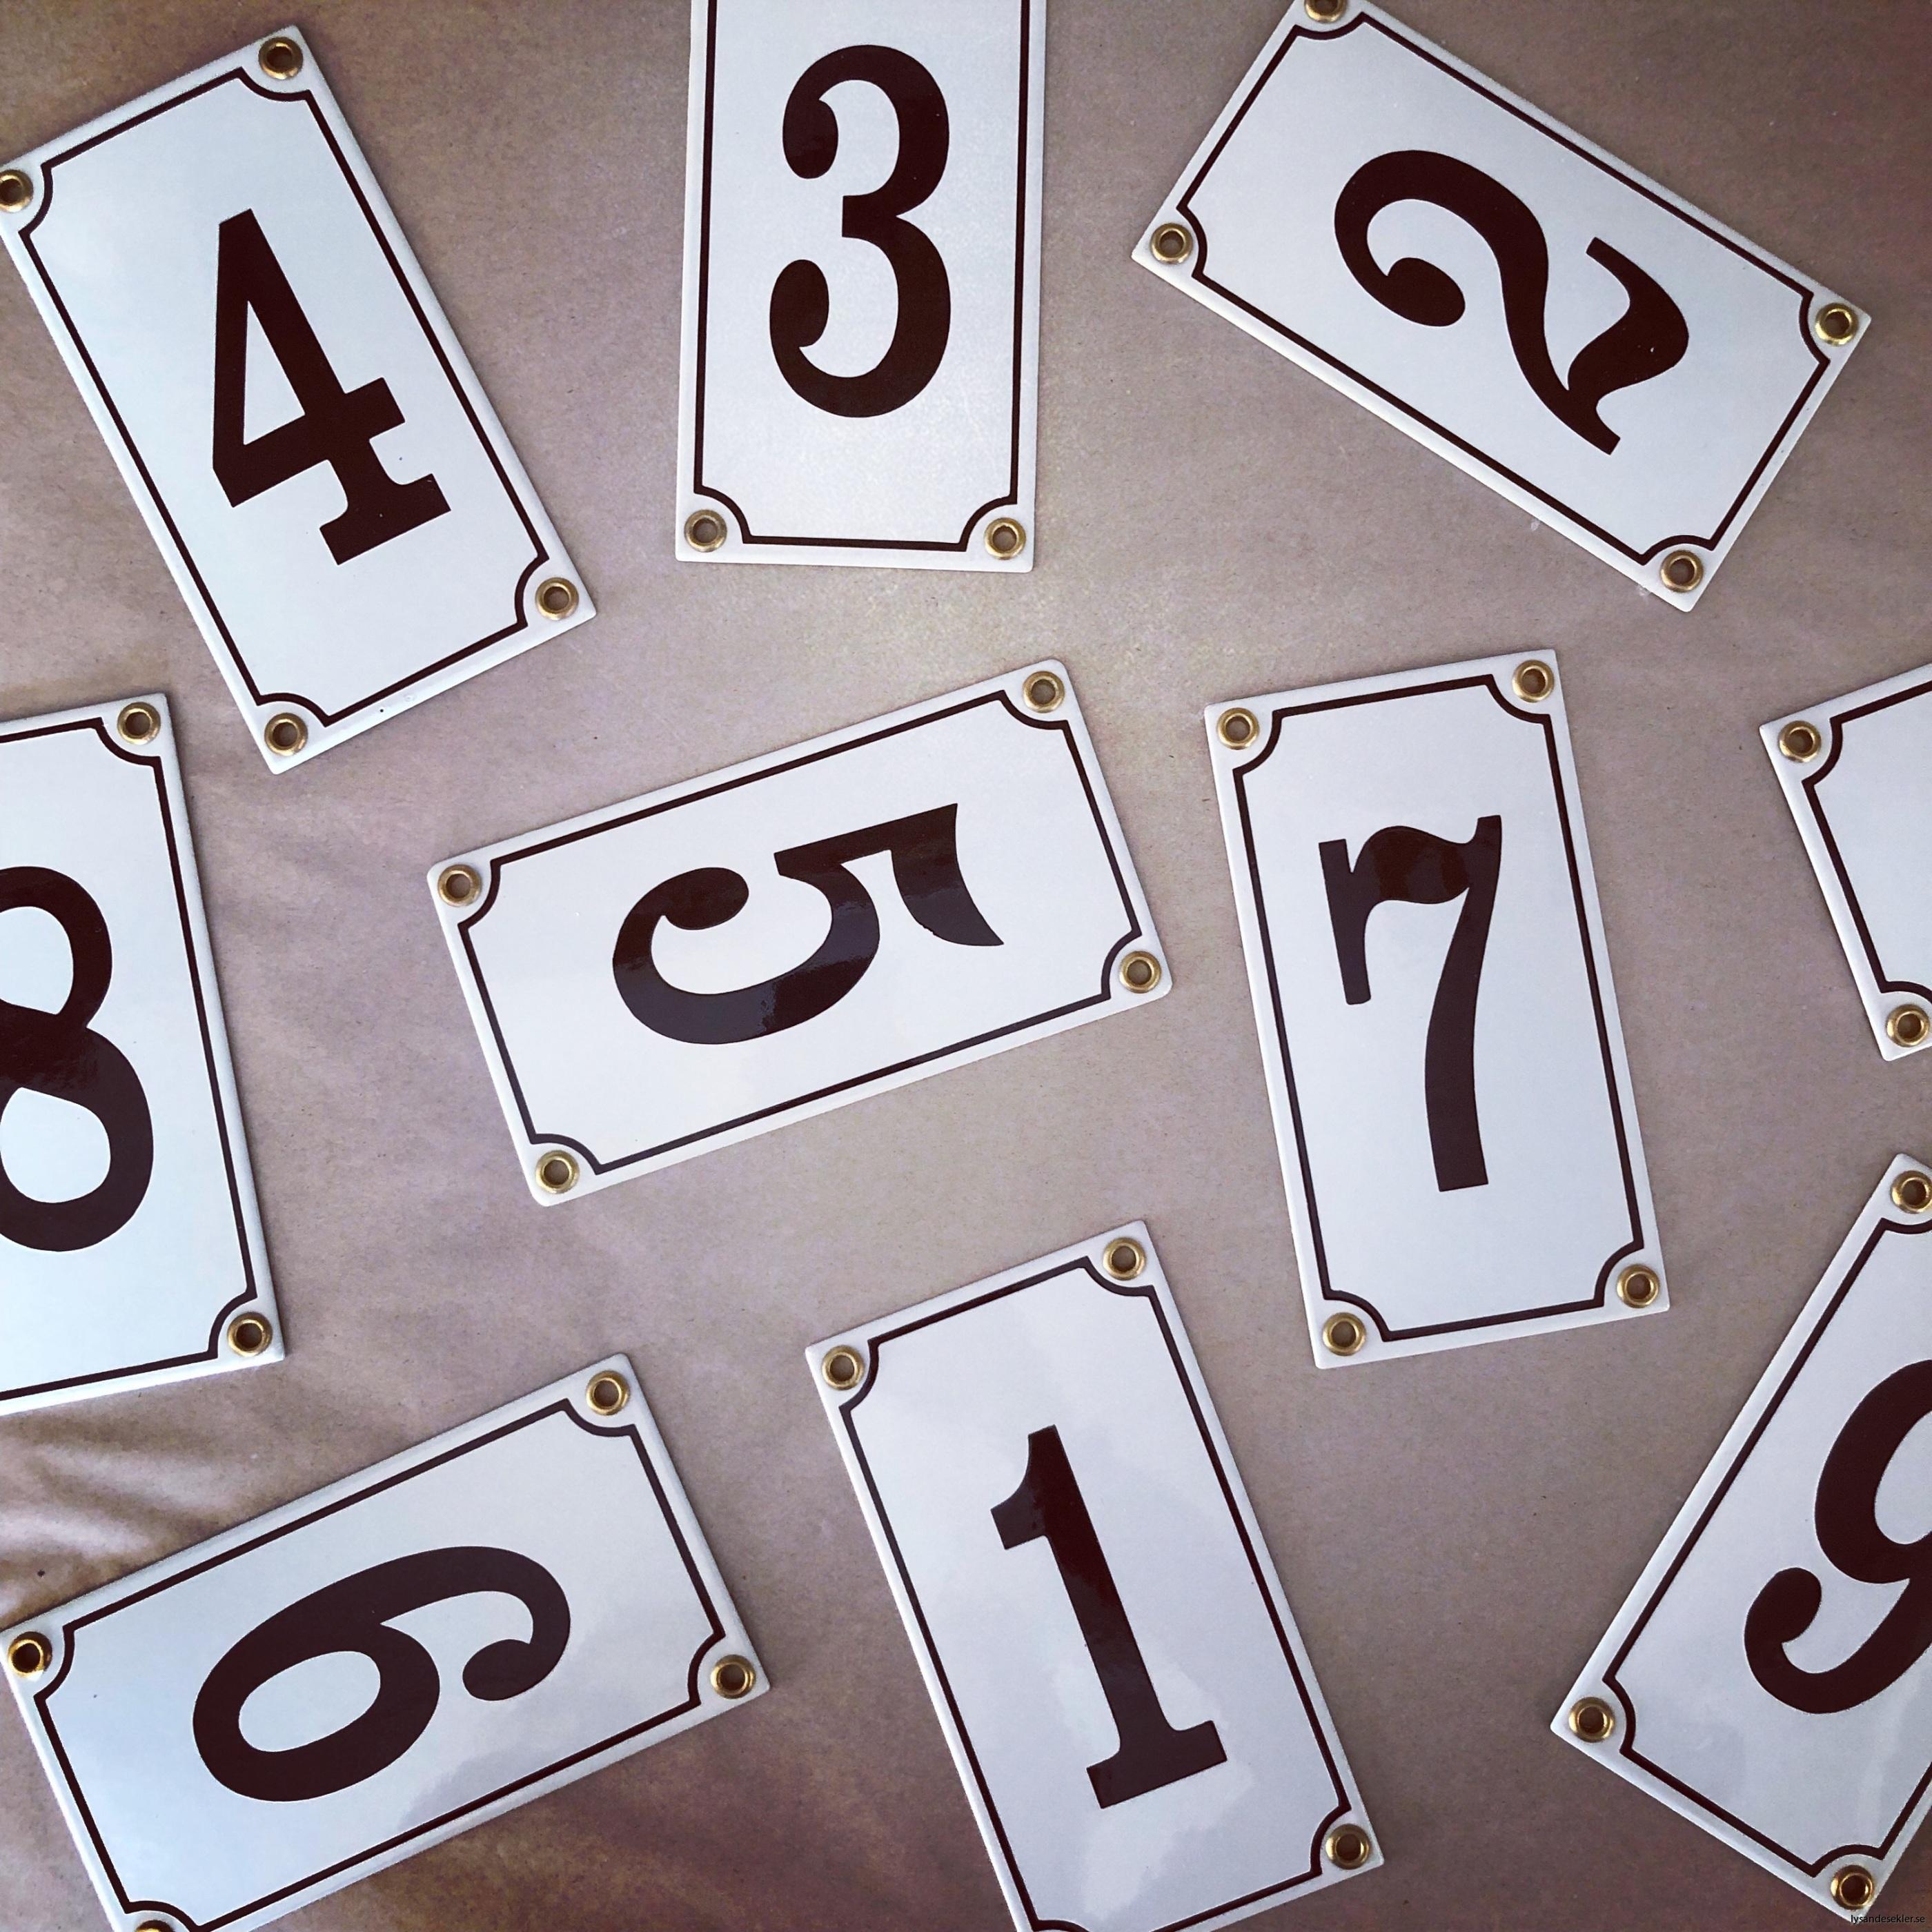 emaljsiffra siffra i emalj fasadsiffra nummer1